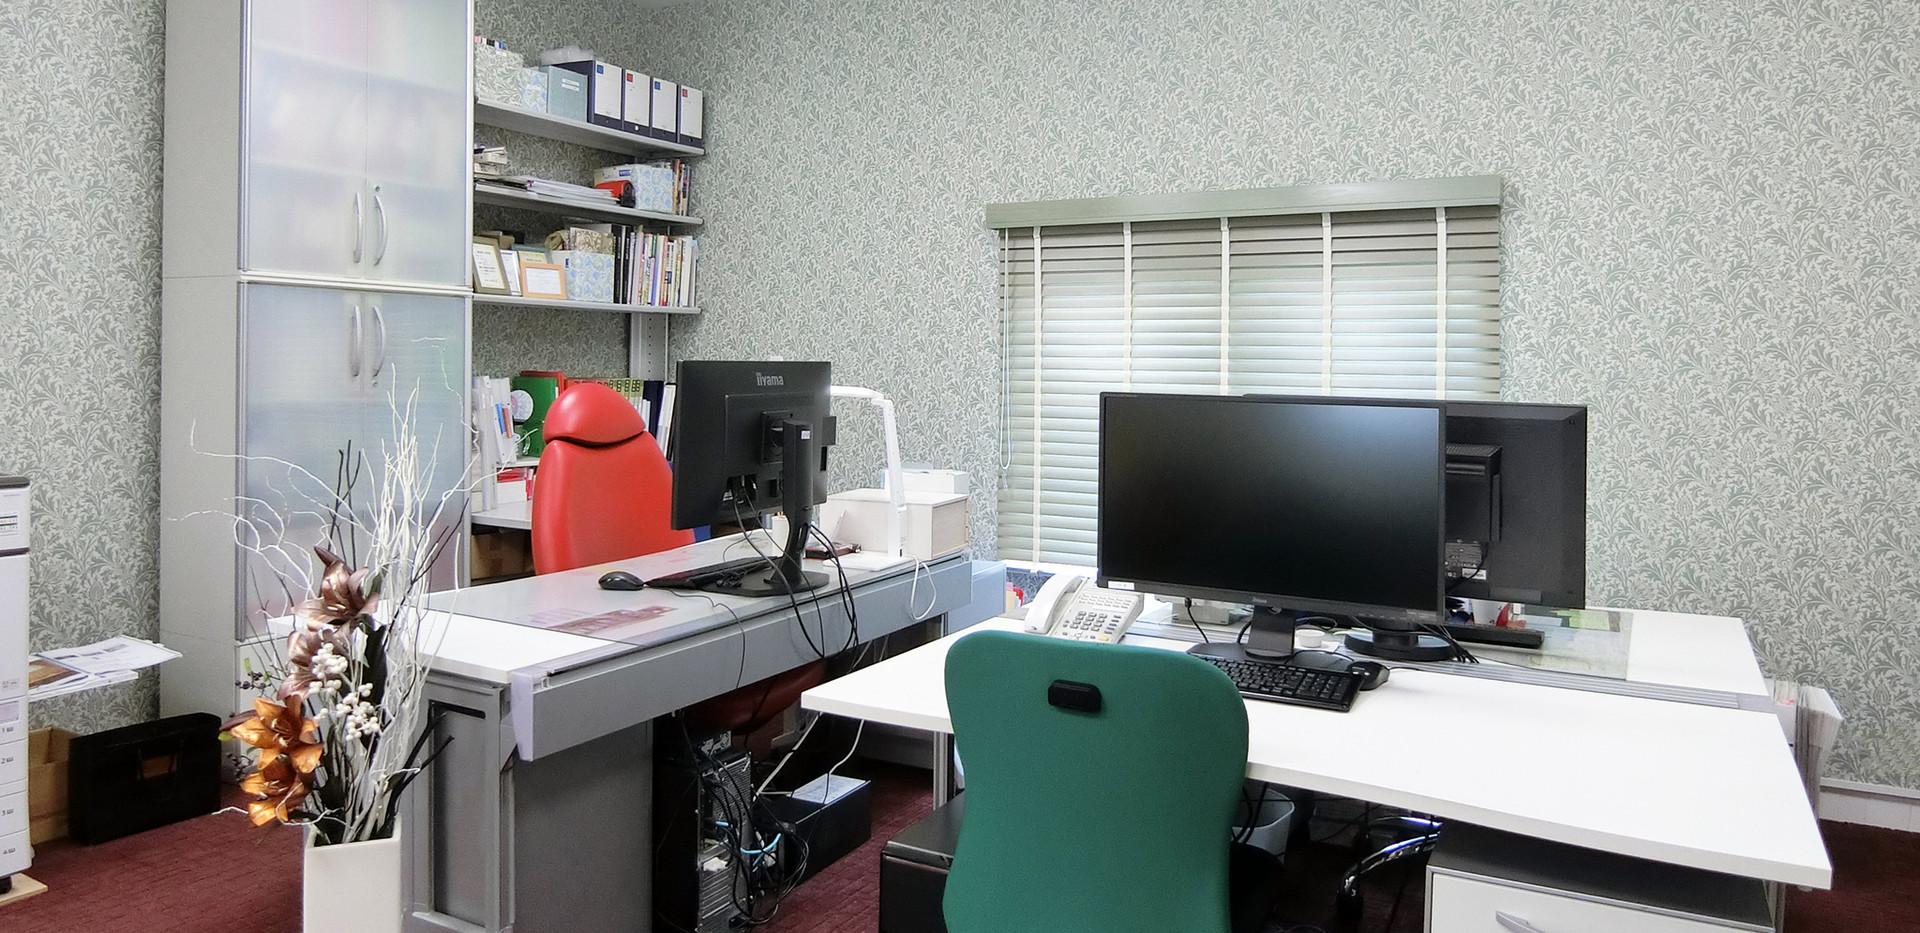 OFFICE(熊谷市)-1F事務所-A-01.jpg